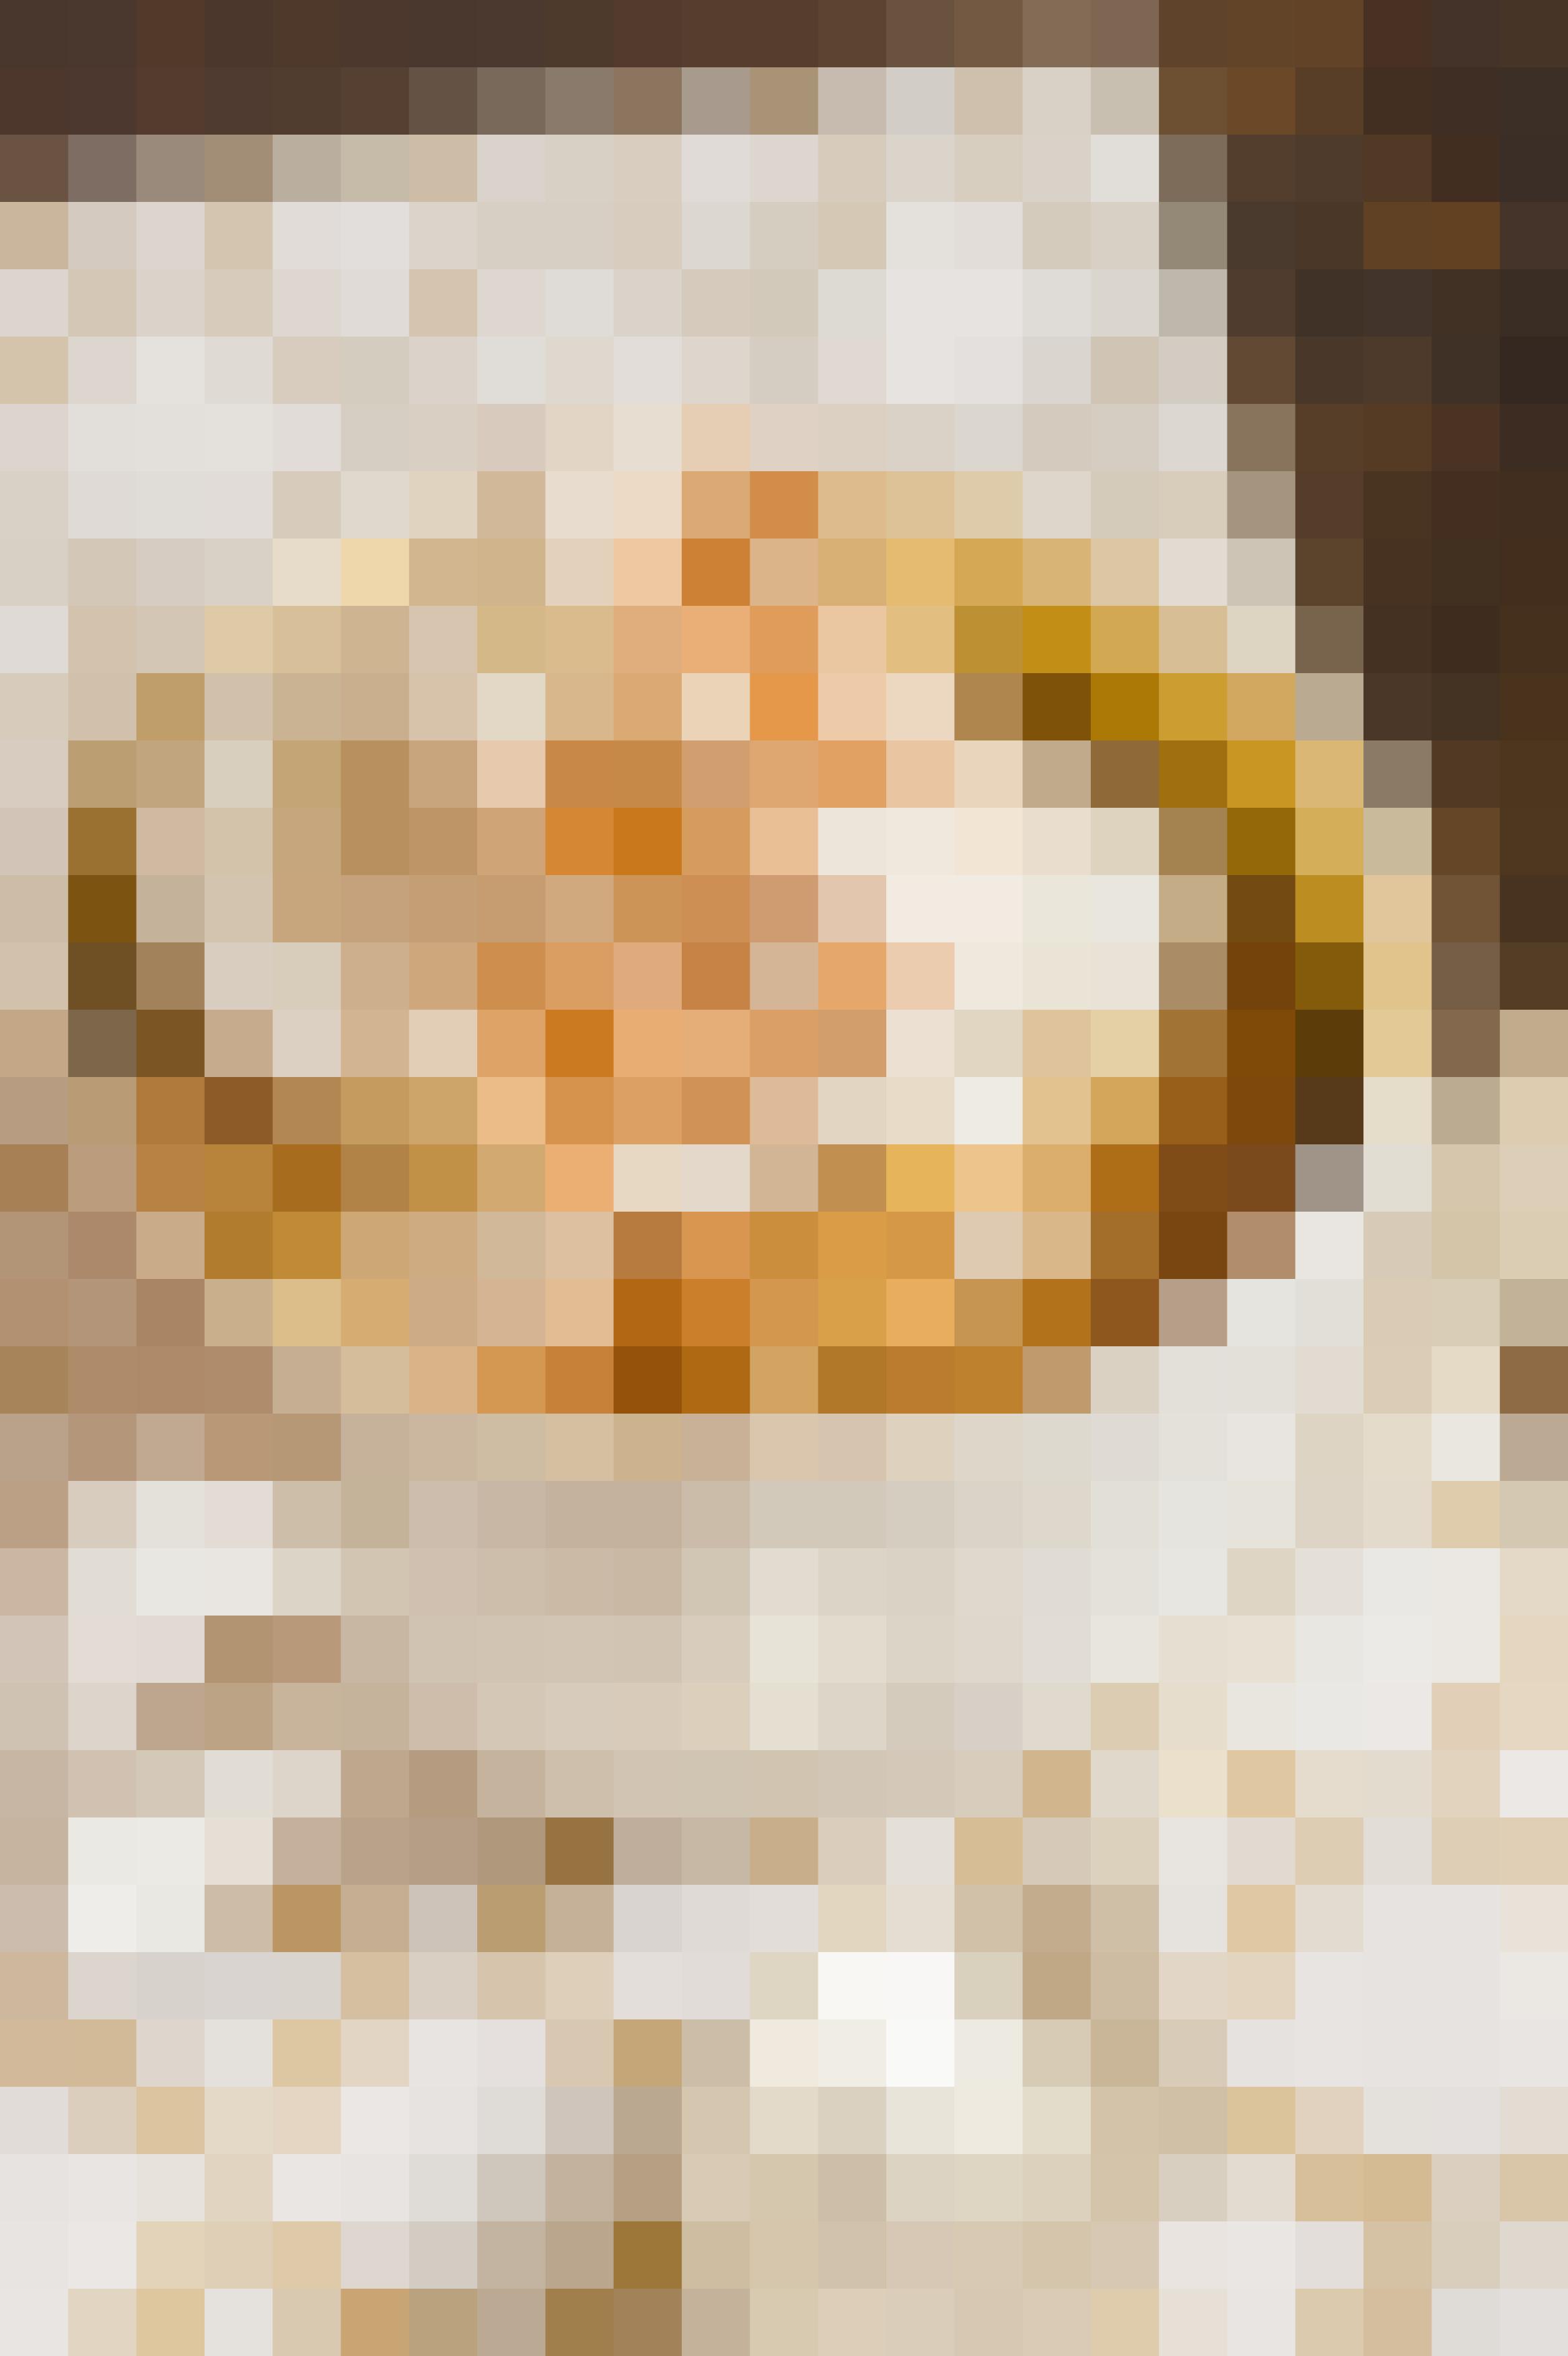 Pumpkin Pie in a Mug, Pull-Apart Cheese Bread, Red Lentil Soup, Lamb Rogan Josh & Pretzel Cinnamon Rolls: gallery image 1